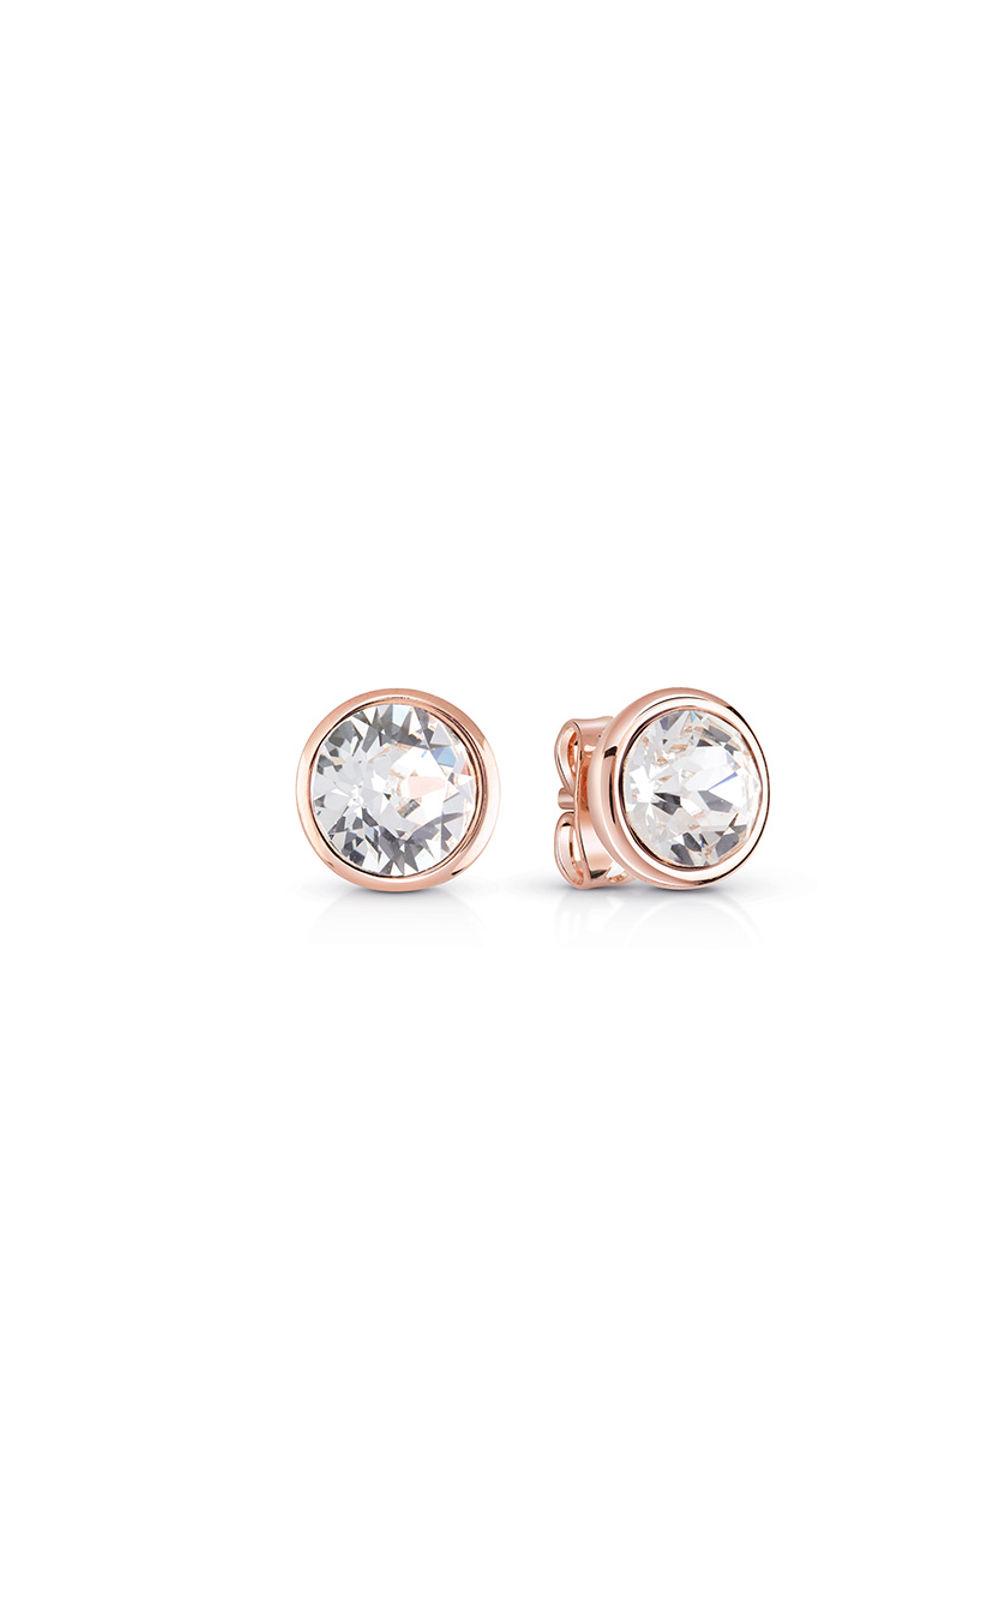 GUESS FAUX UBE83060 Ροζ Χρυσά Σκουλαρίκια Με Πέτρα b936a59f441